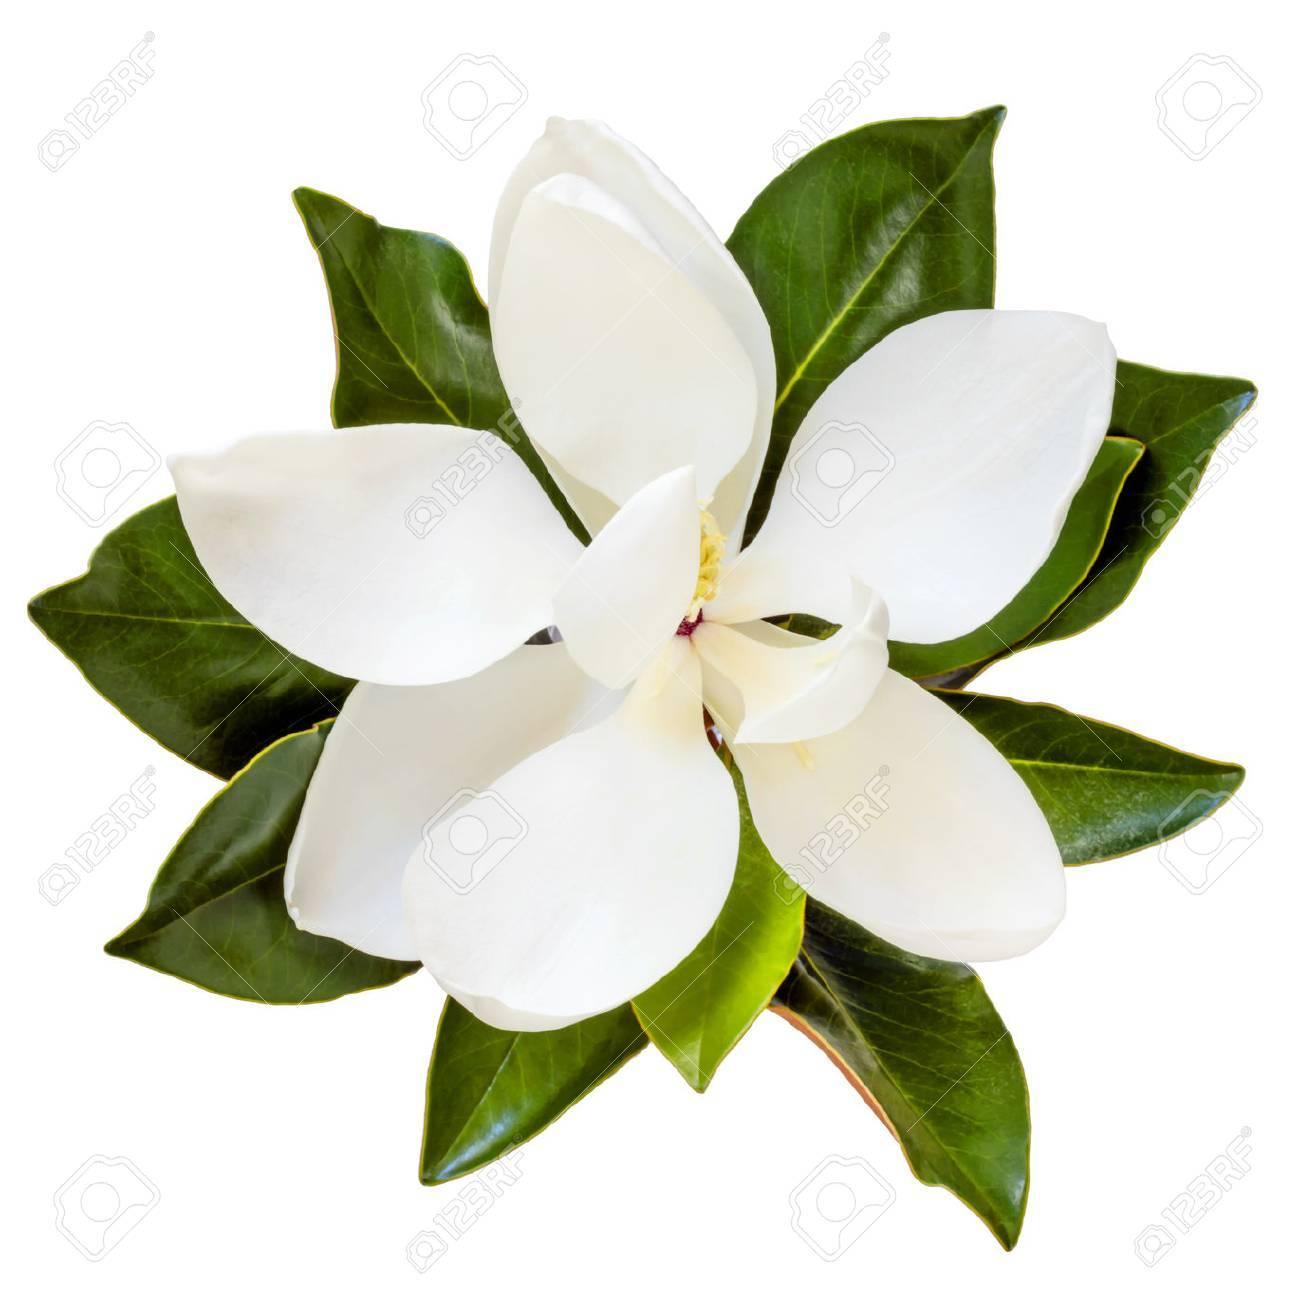 Magnolia flower, top view, isolated on white. Dwarf variety of magnolia grandiflora, Little Gem. - 75683963